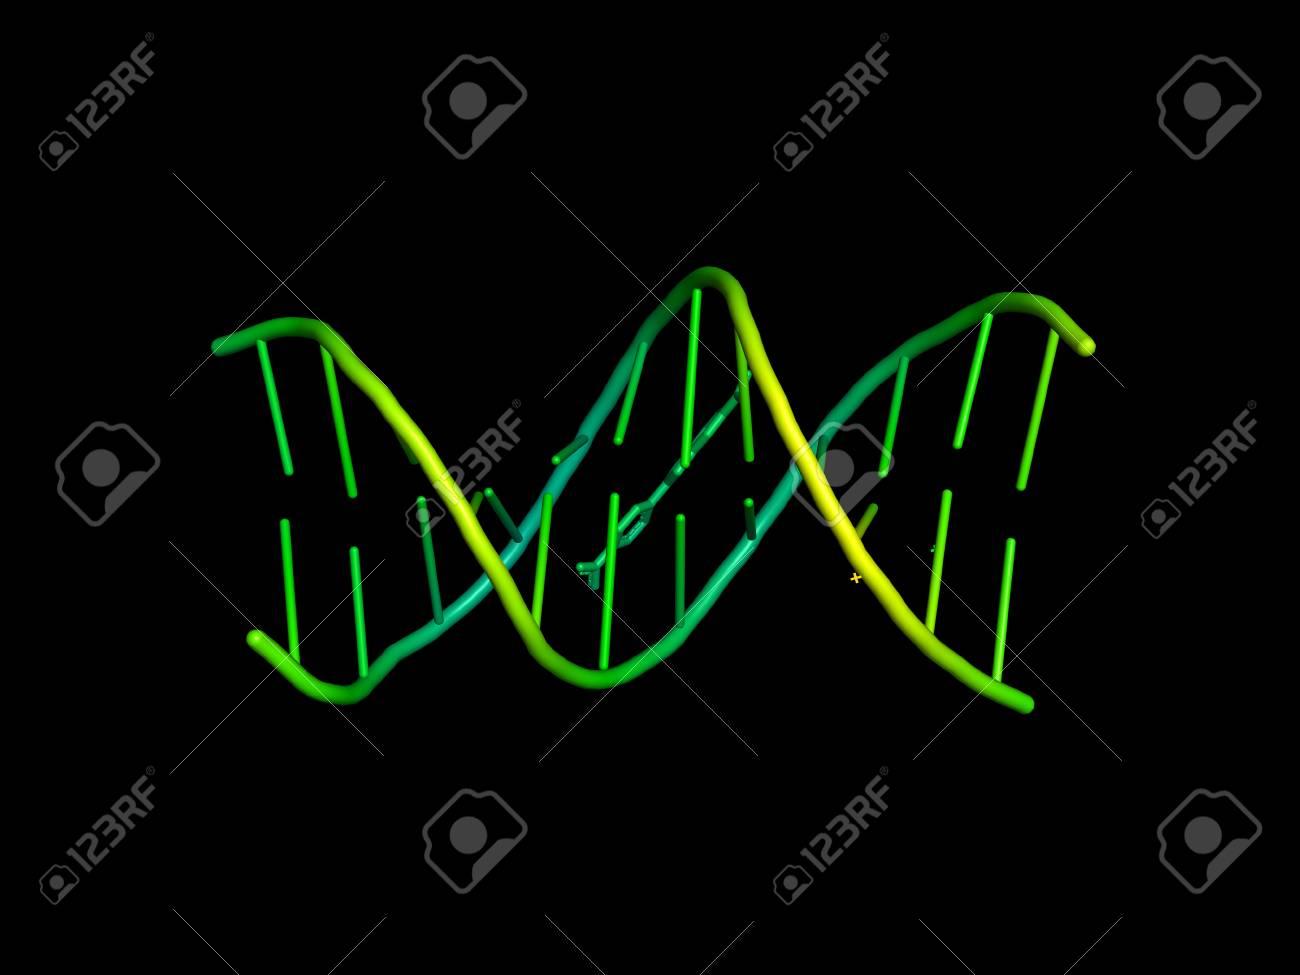 3d model of dna structure of biological macromolecules stock photo 3d model of dna structure of biological macromolecules stock photo 99861977 ccuart Gallery